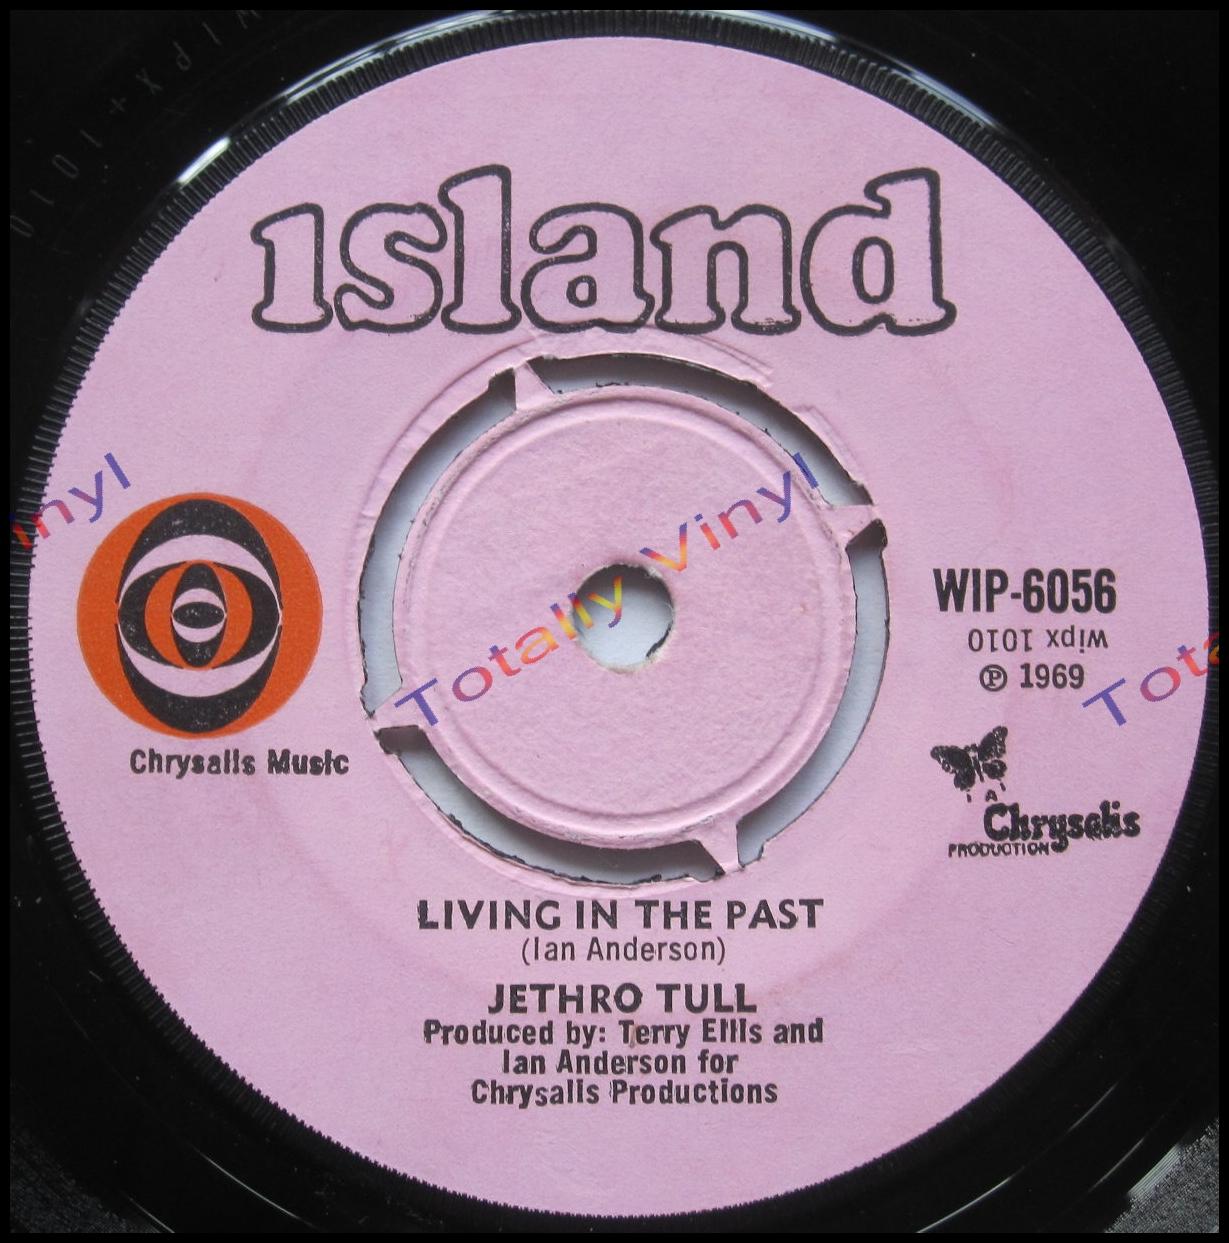 Totally Vinyl Records Jethro Tull Living In The Past